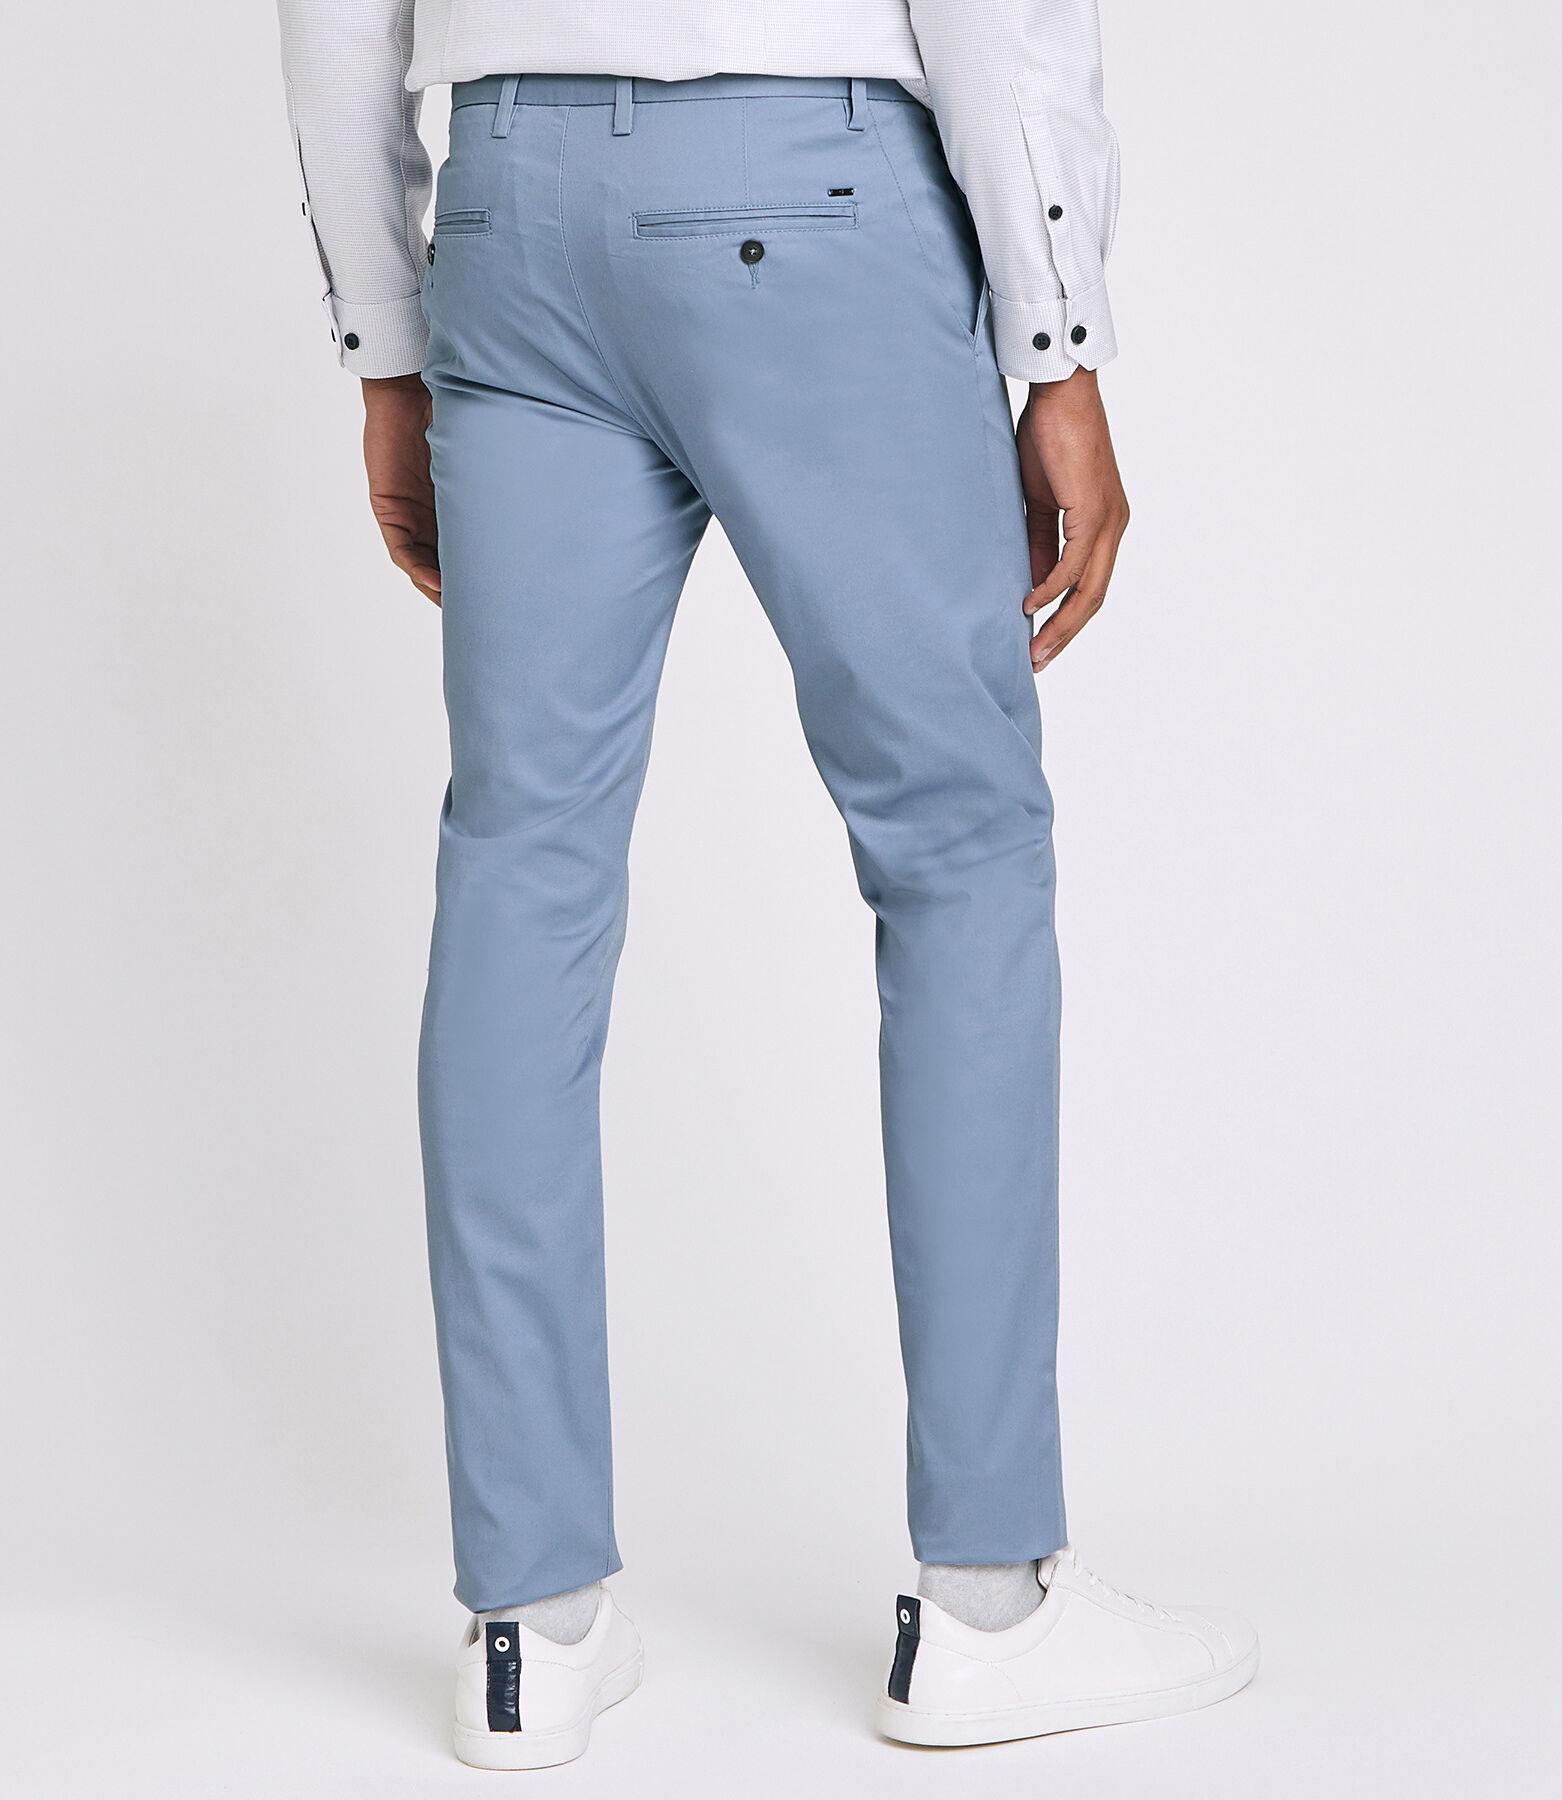 Pantalon Urbain Bleu Ciel